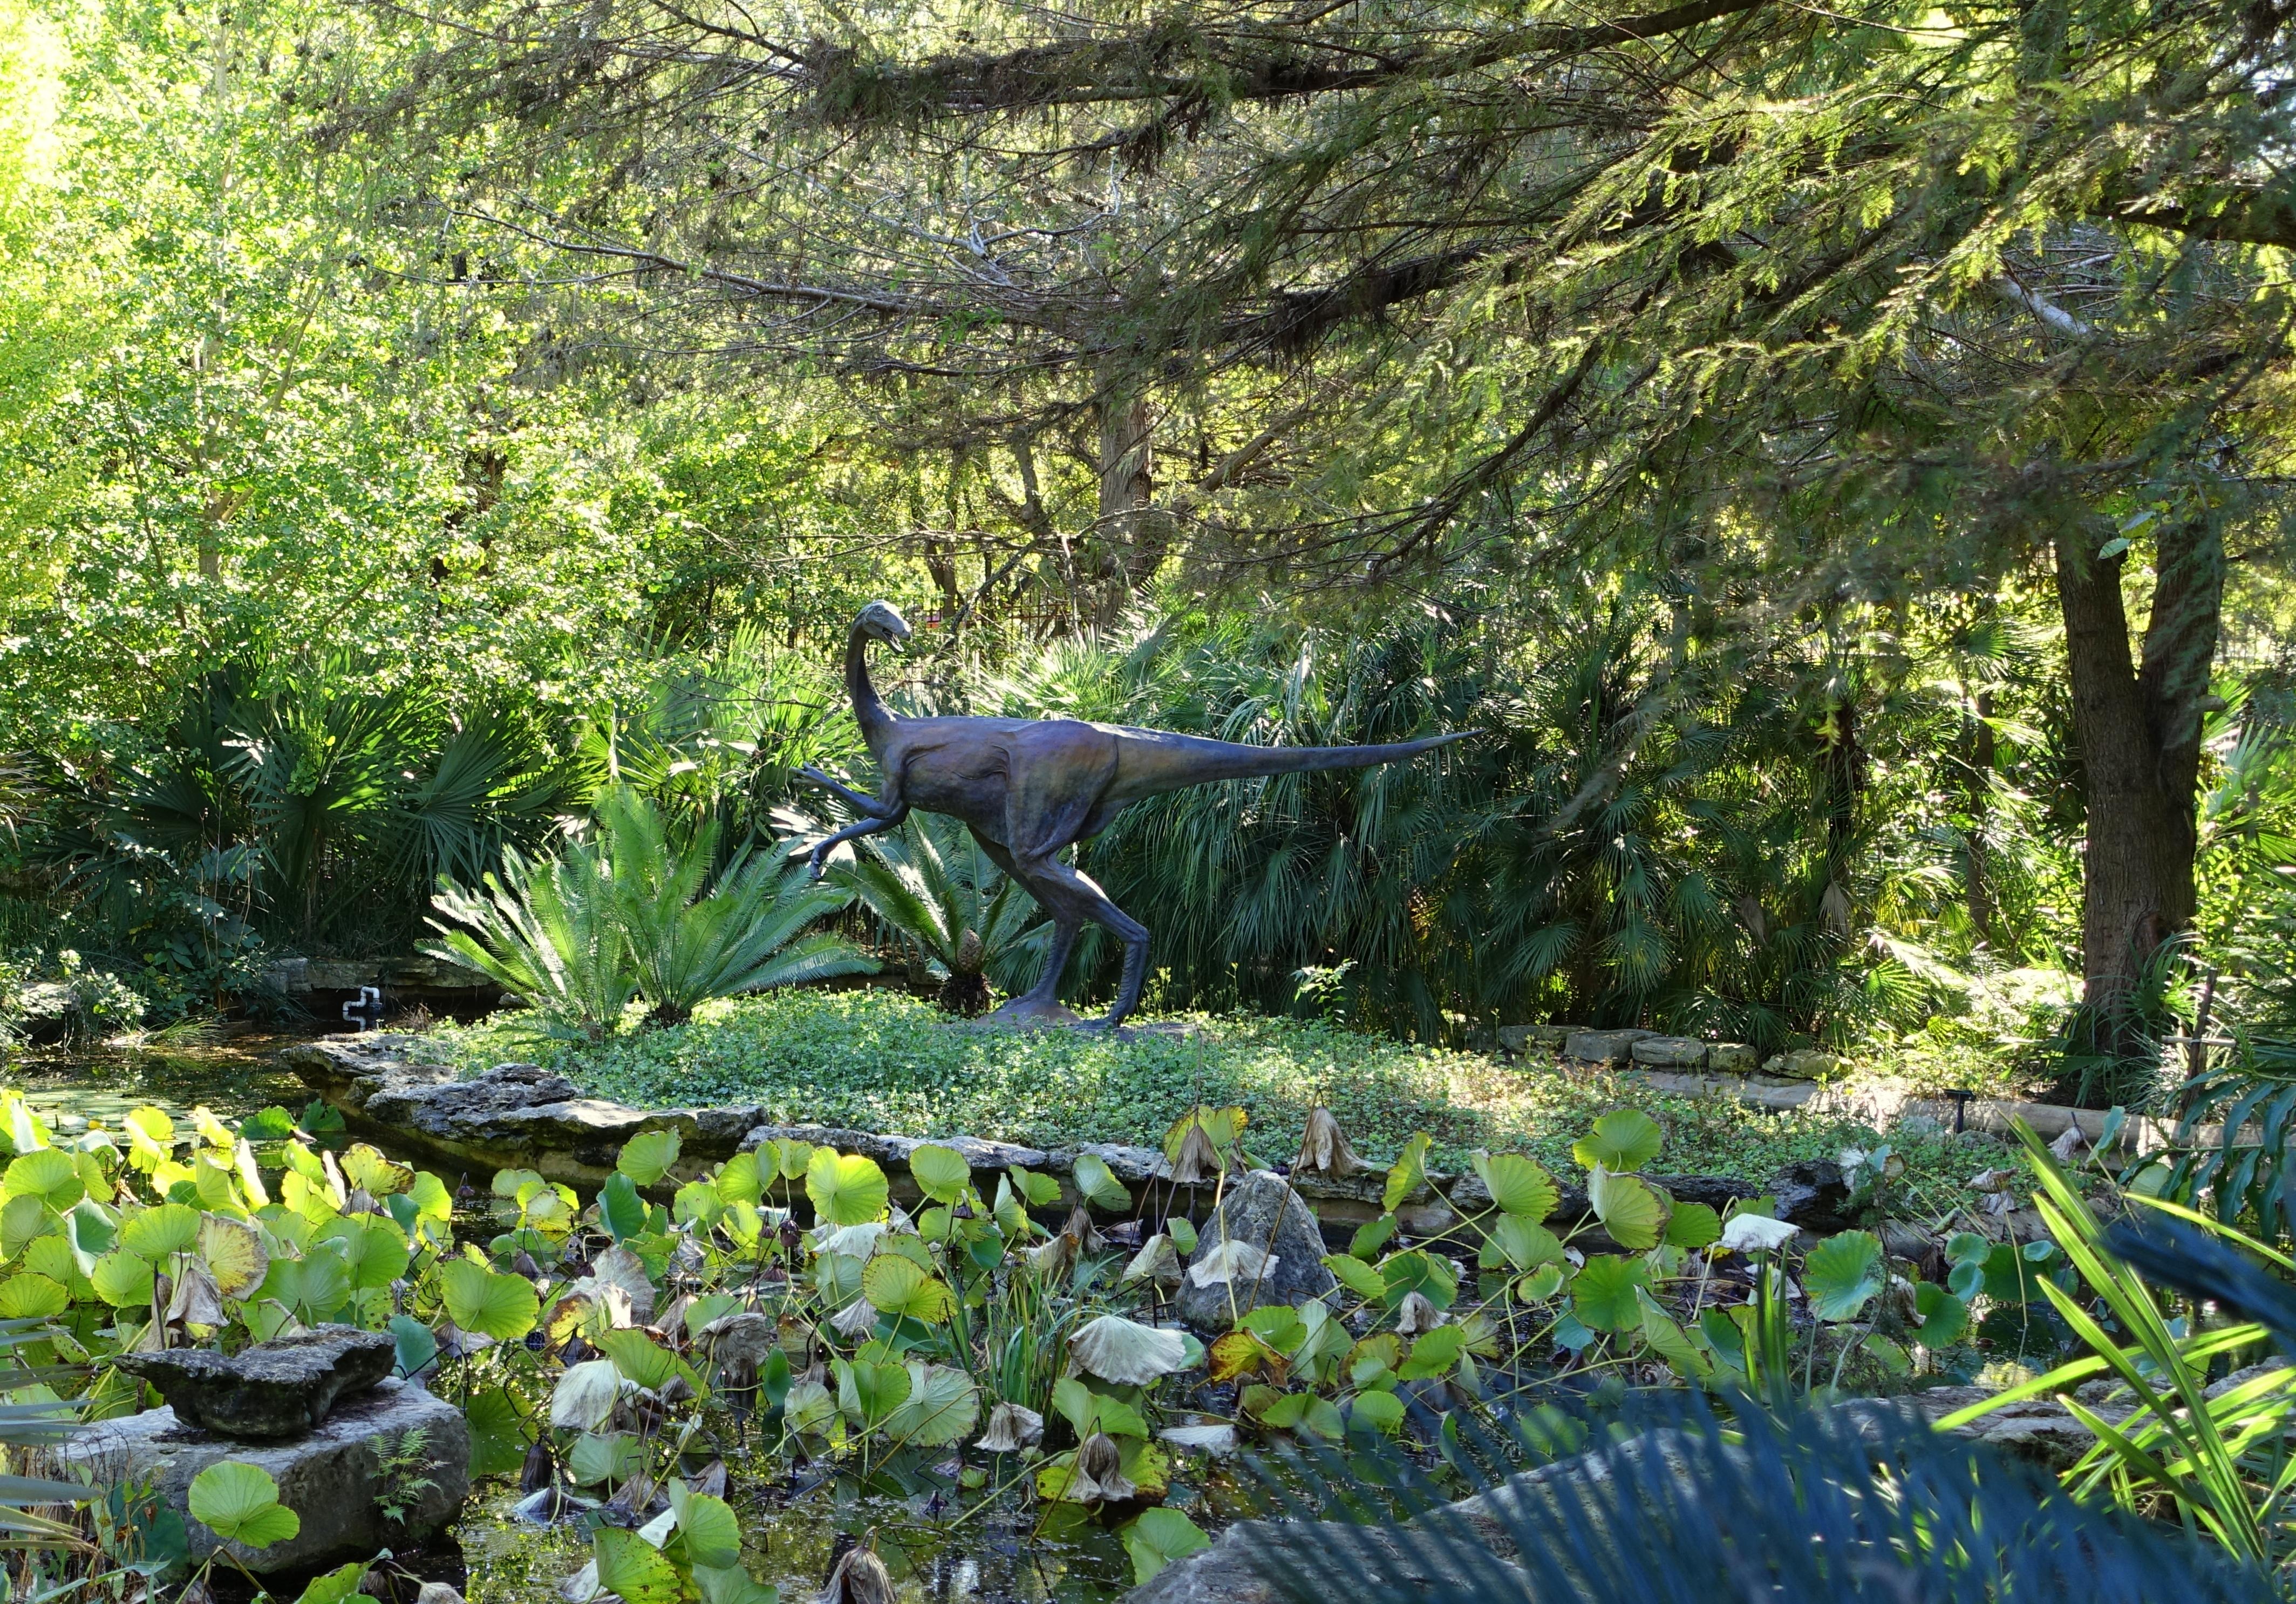 File:Dinosaur Sculpture   Hartman Prehistoric Garden   Zilker Botanical  Garden   Austin, Texas